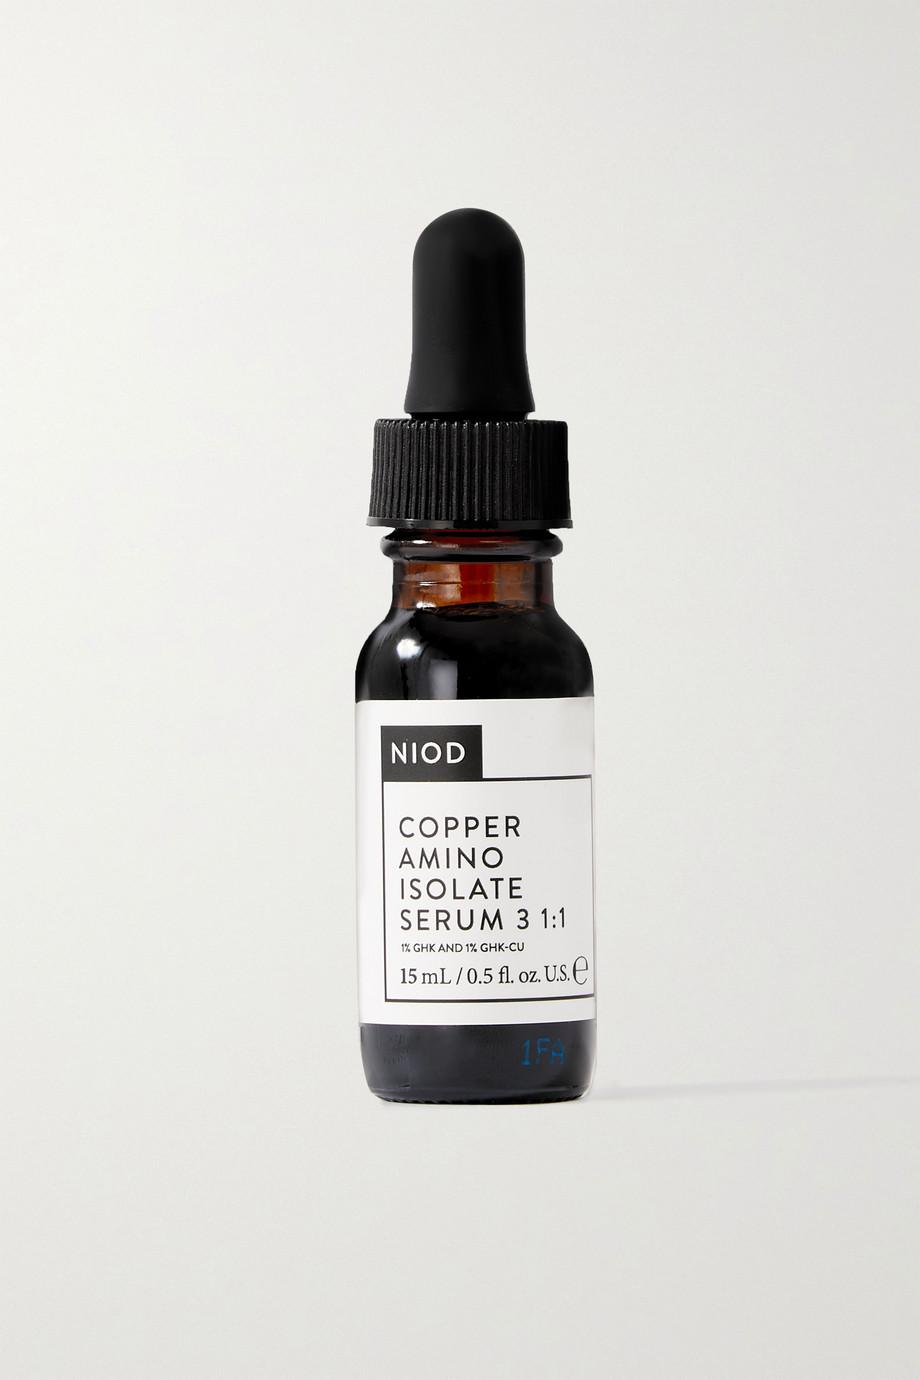 NIOD Copper Amino Isolate Serum 2:1, 15 ml – Serum